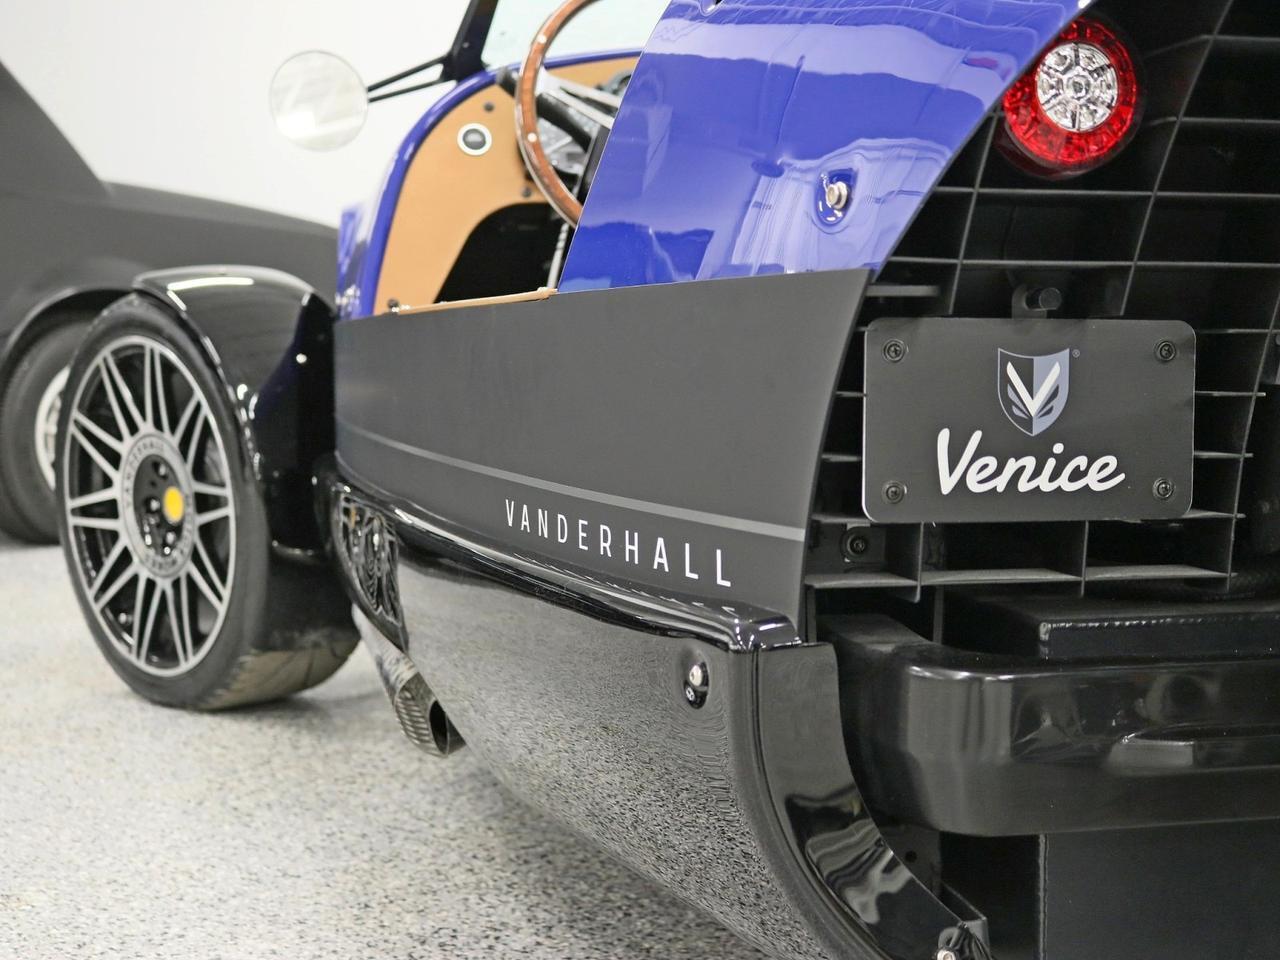 2021 Vanderhall Venice  Hickory Hills IL